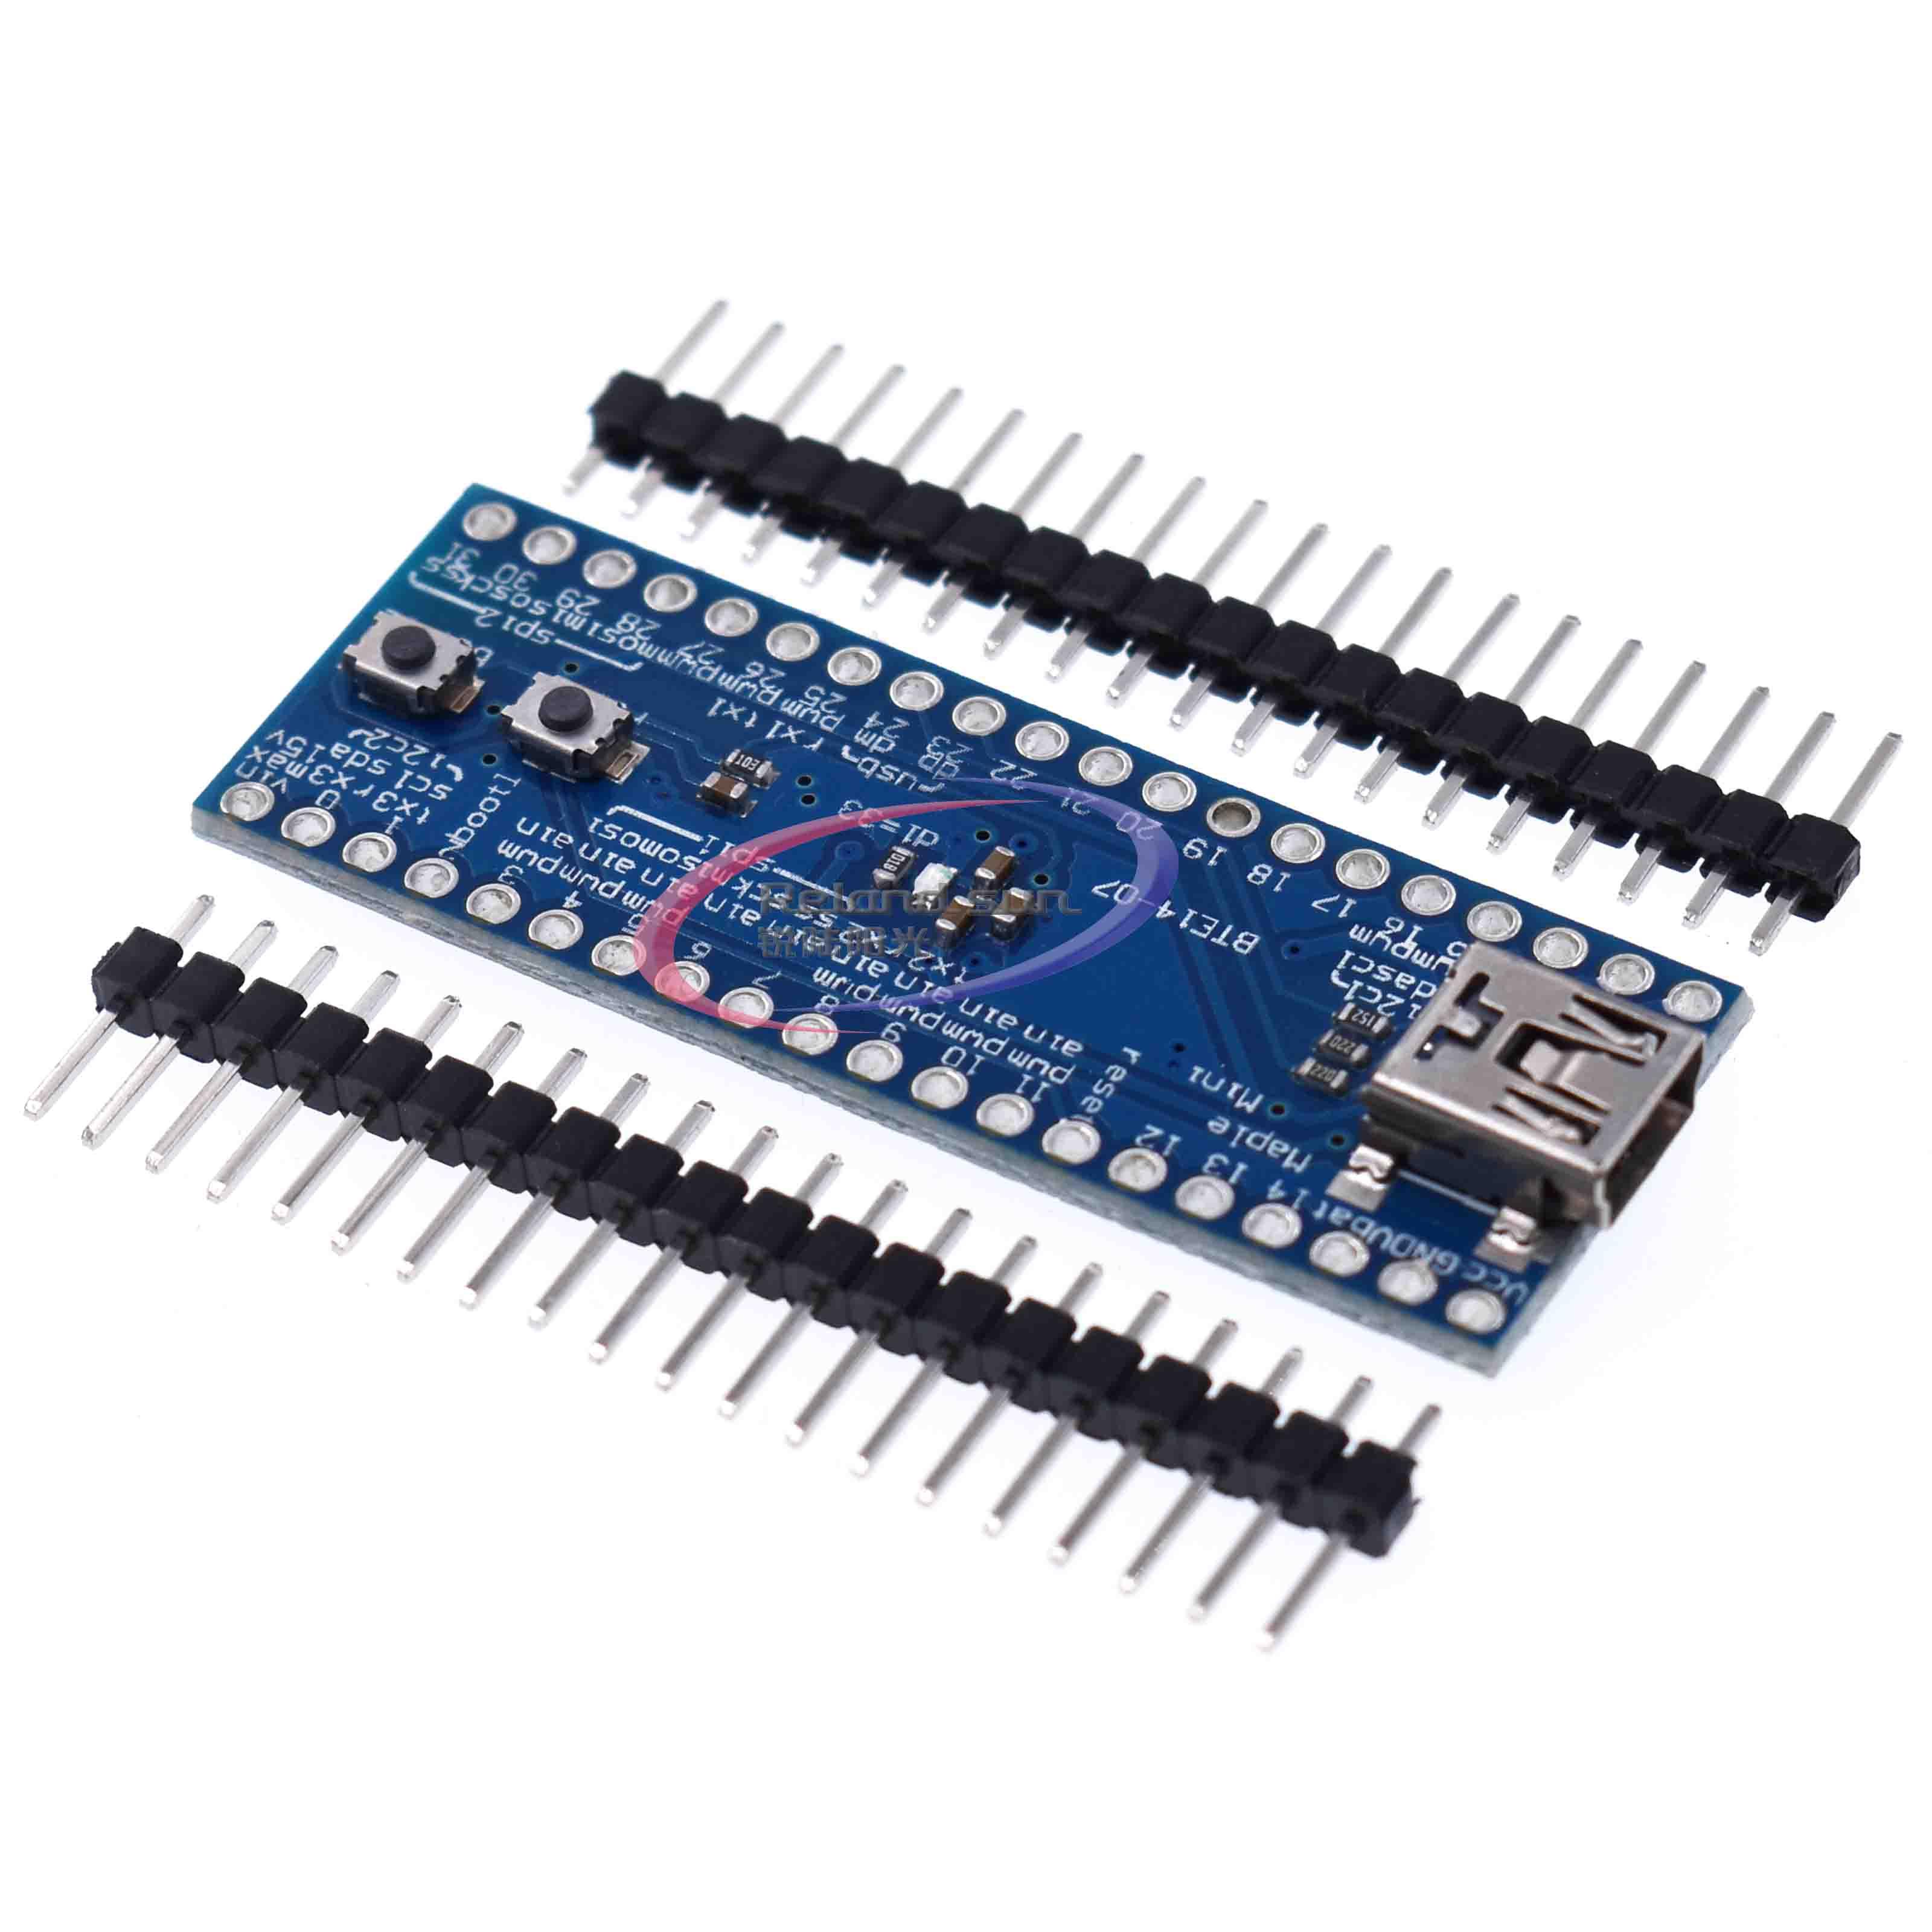 Mini USB STM32F103RCBT6 Maple Mini 32 ARM Cortex-M3 3.3V 72MHz 128KB Flash Board Module For Arduino With SPI/I2C USART 34Pins